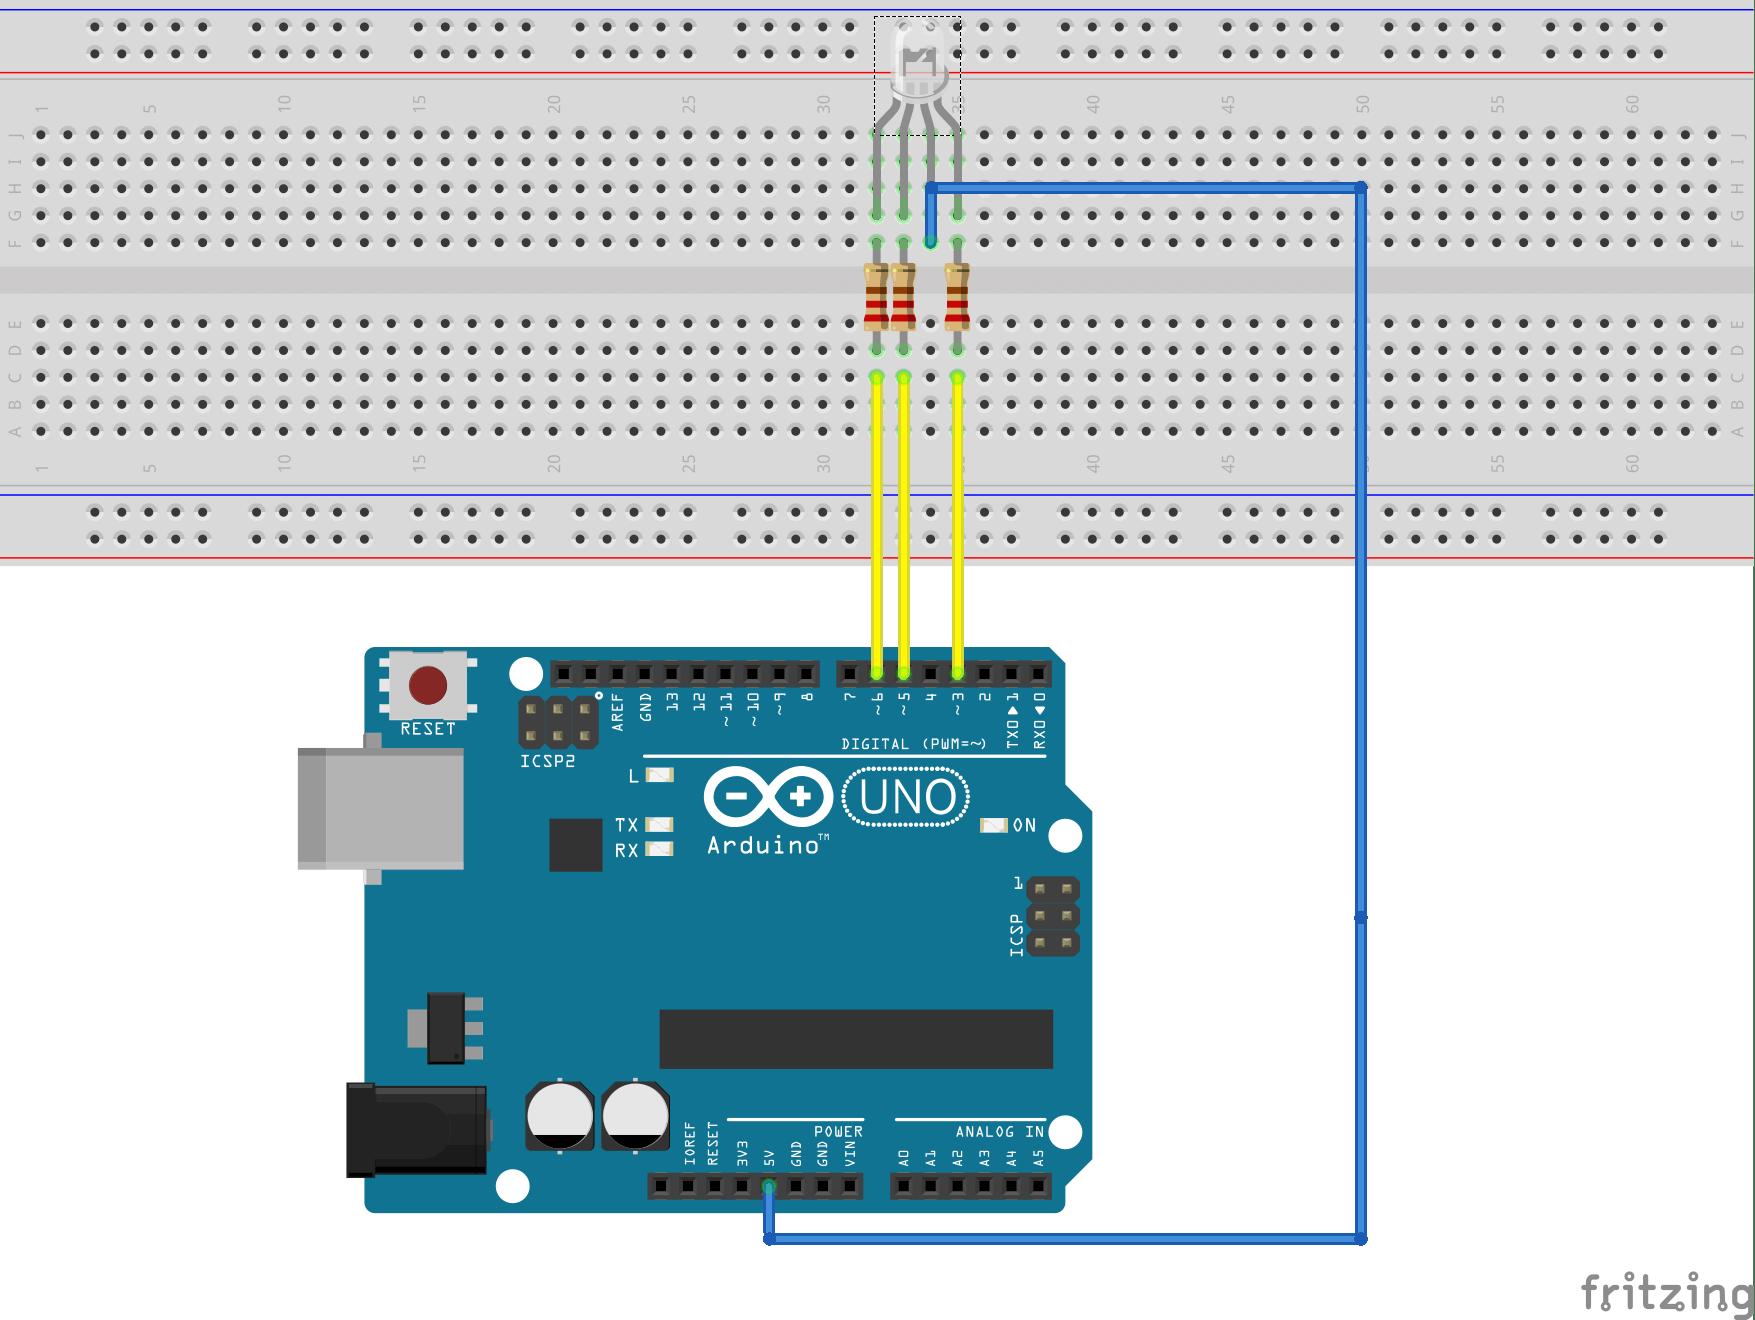 control rub led using arduino